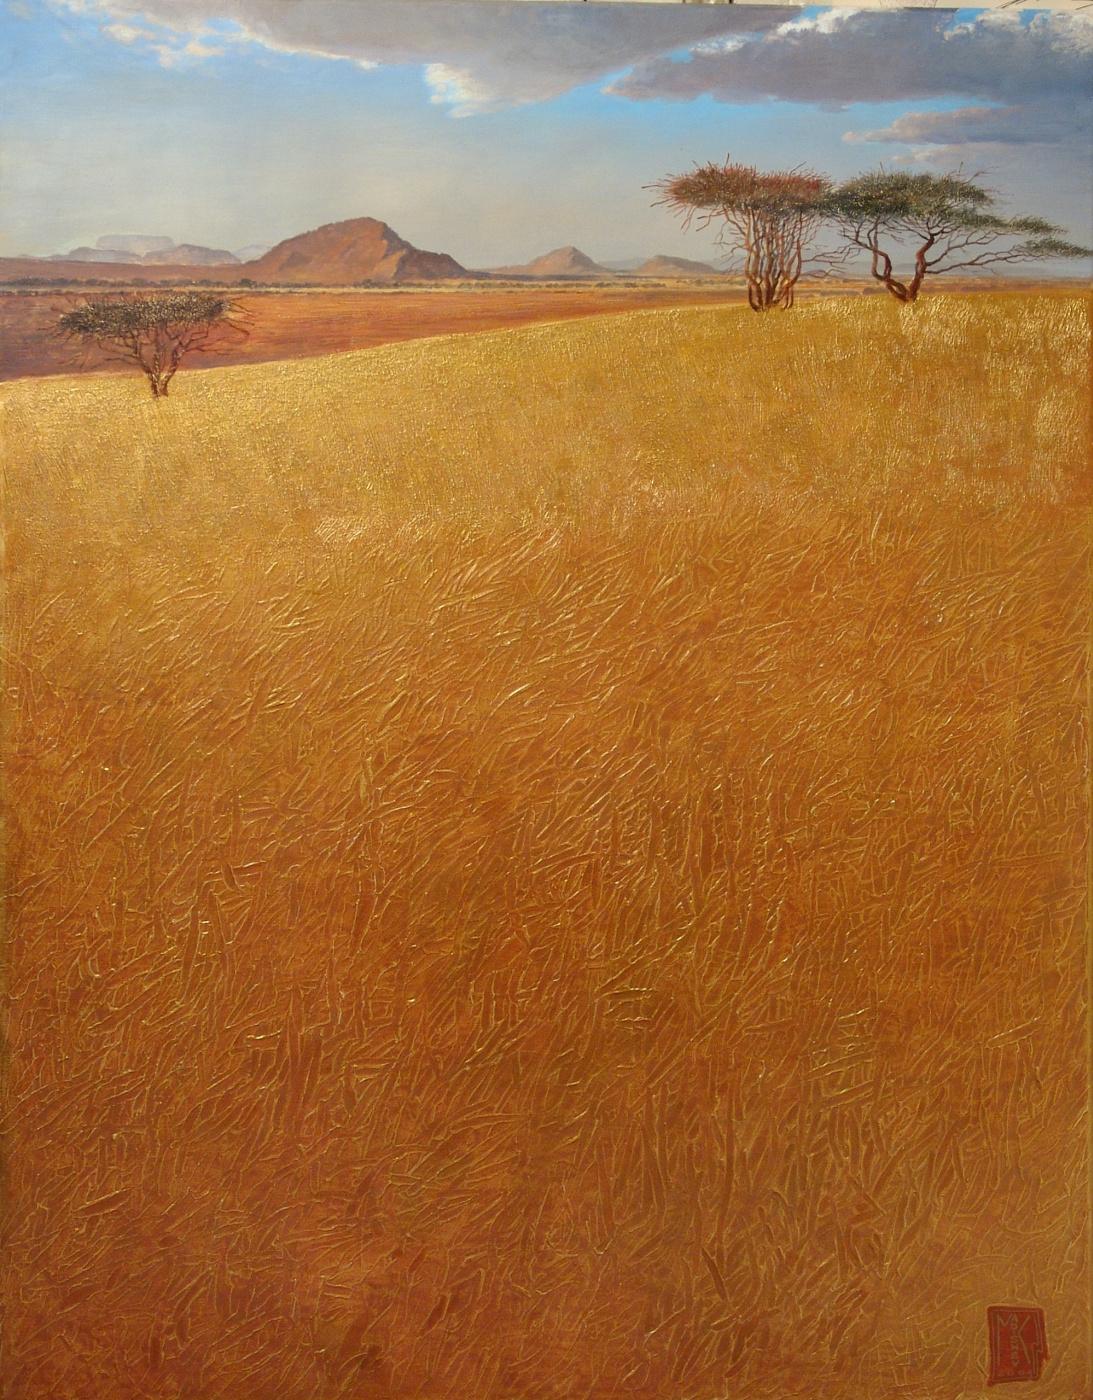 Марат Ильгизович Кадышев. Africa